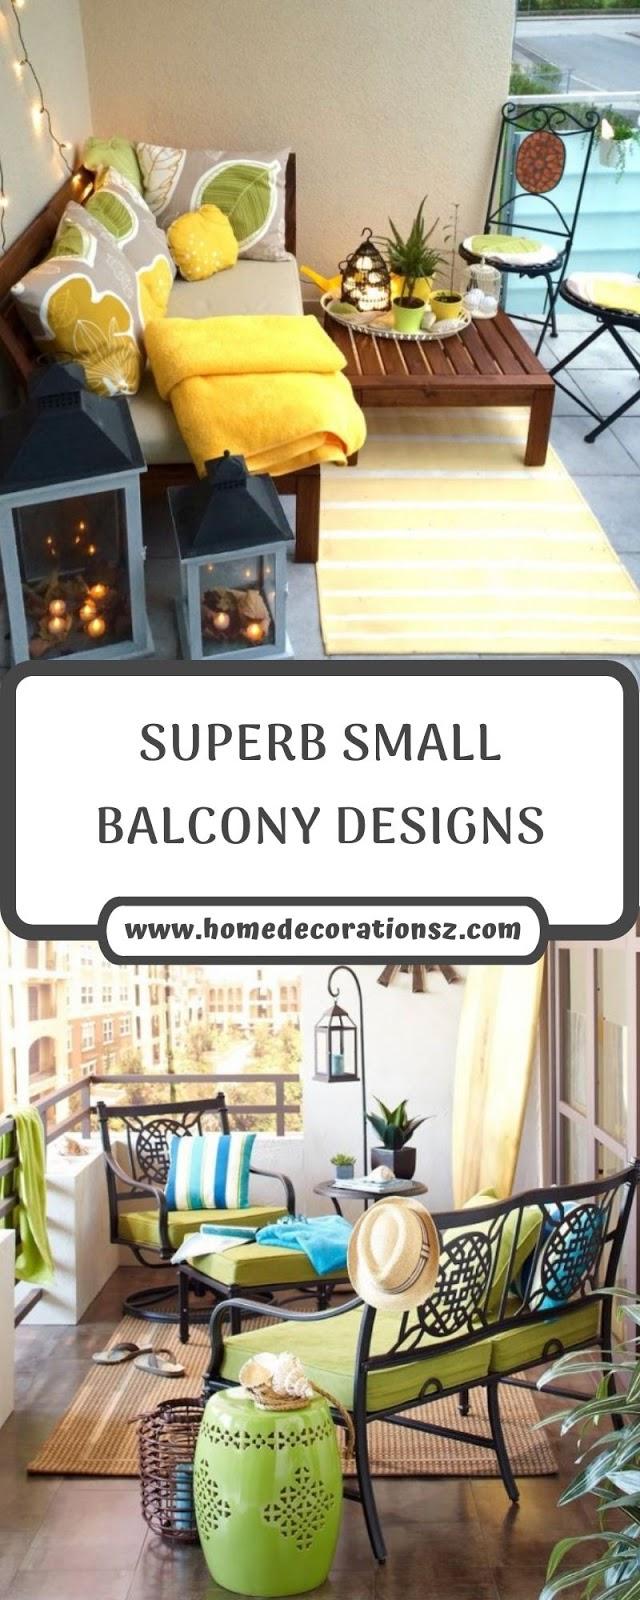 SUPERB SMALL BALCONY DESIGNS